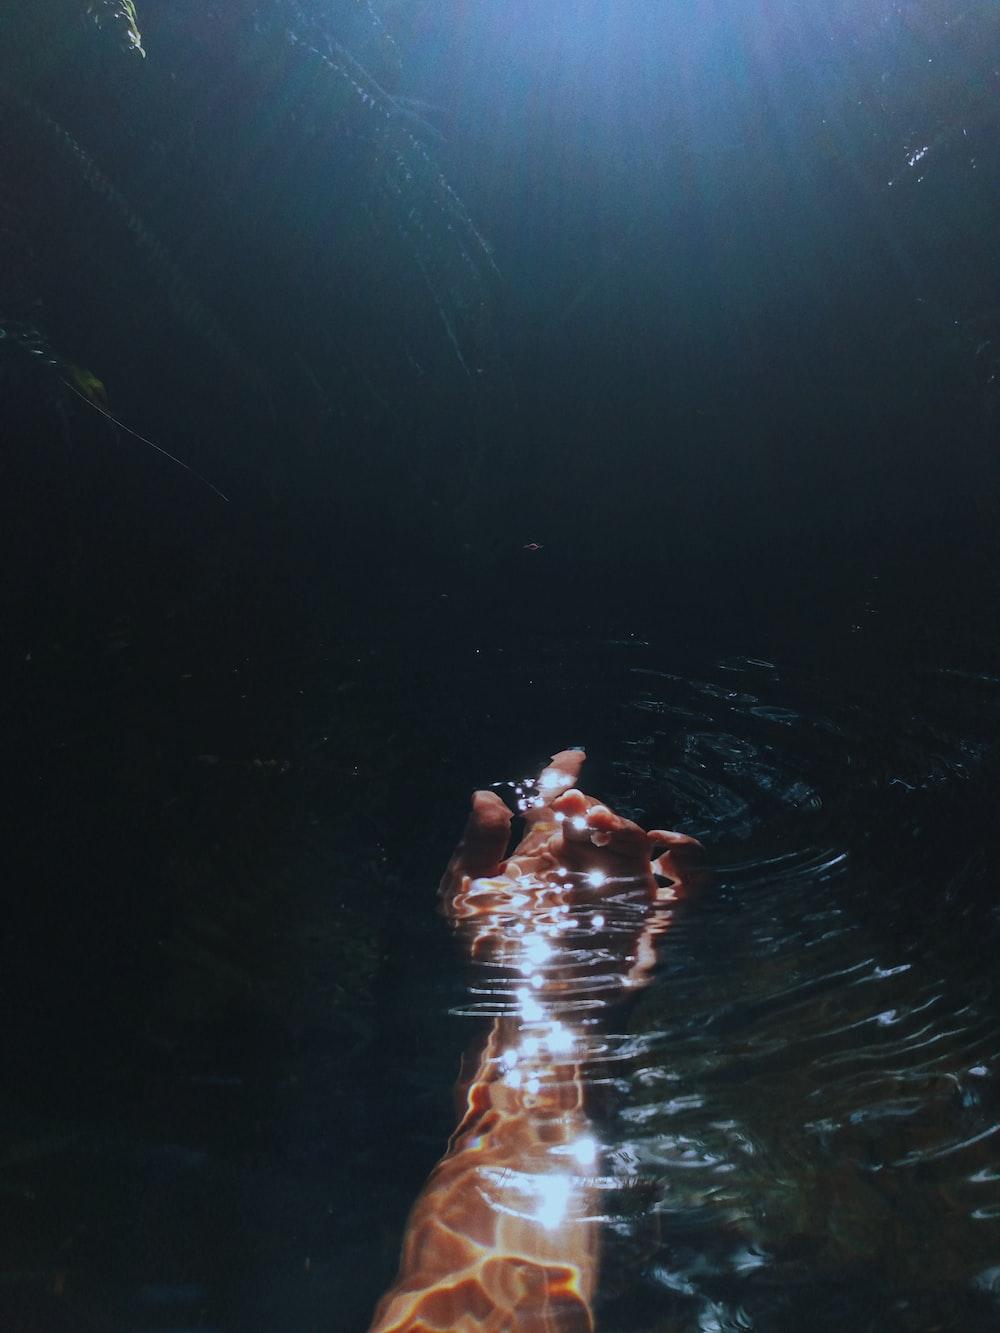 woman in water in water